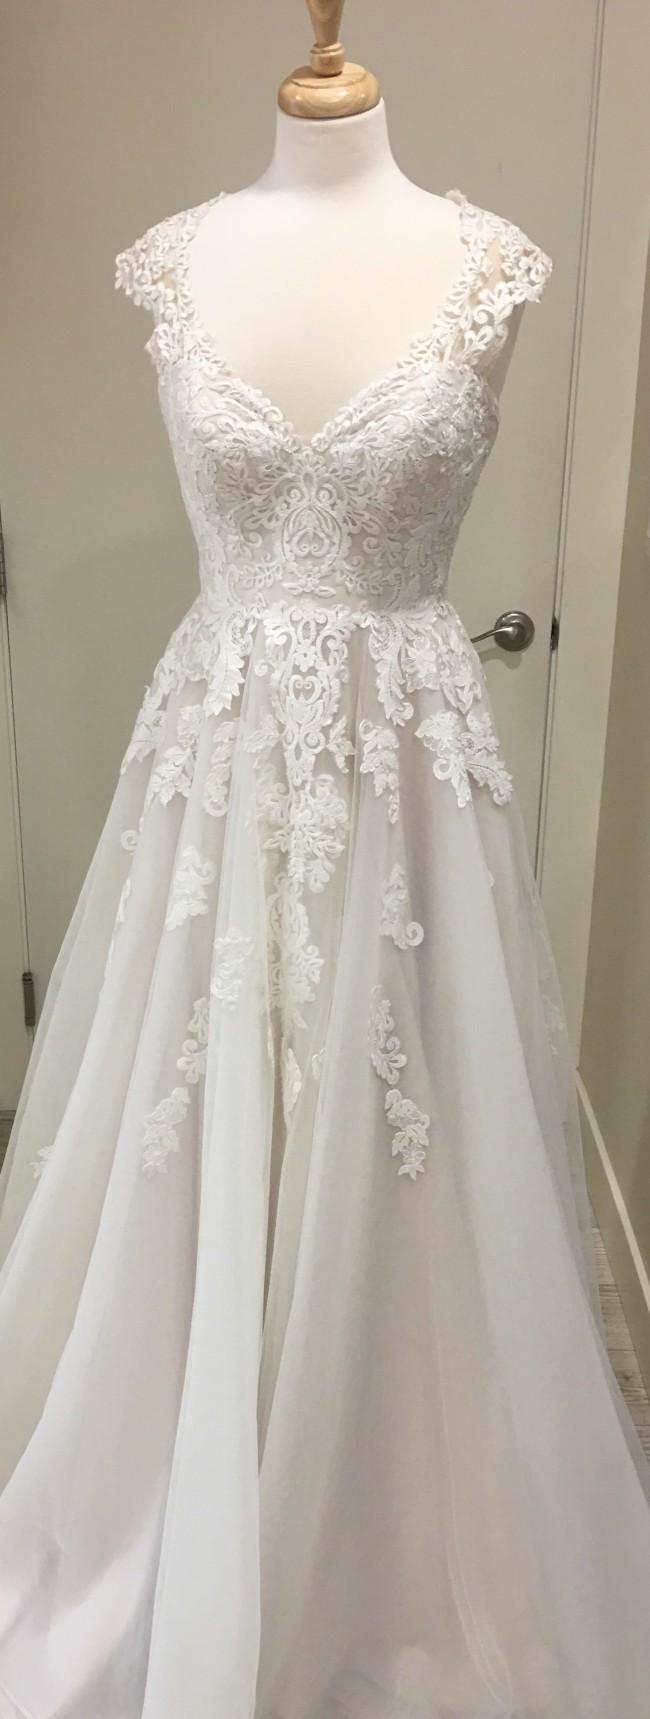 539dfb00d1 Stella York 6391 Sample Wedding Dress on Sale 30% Off - Stillwhite